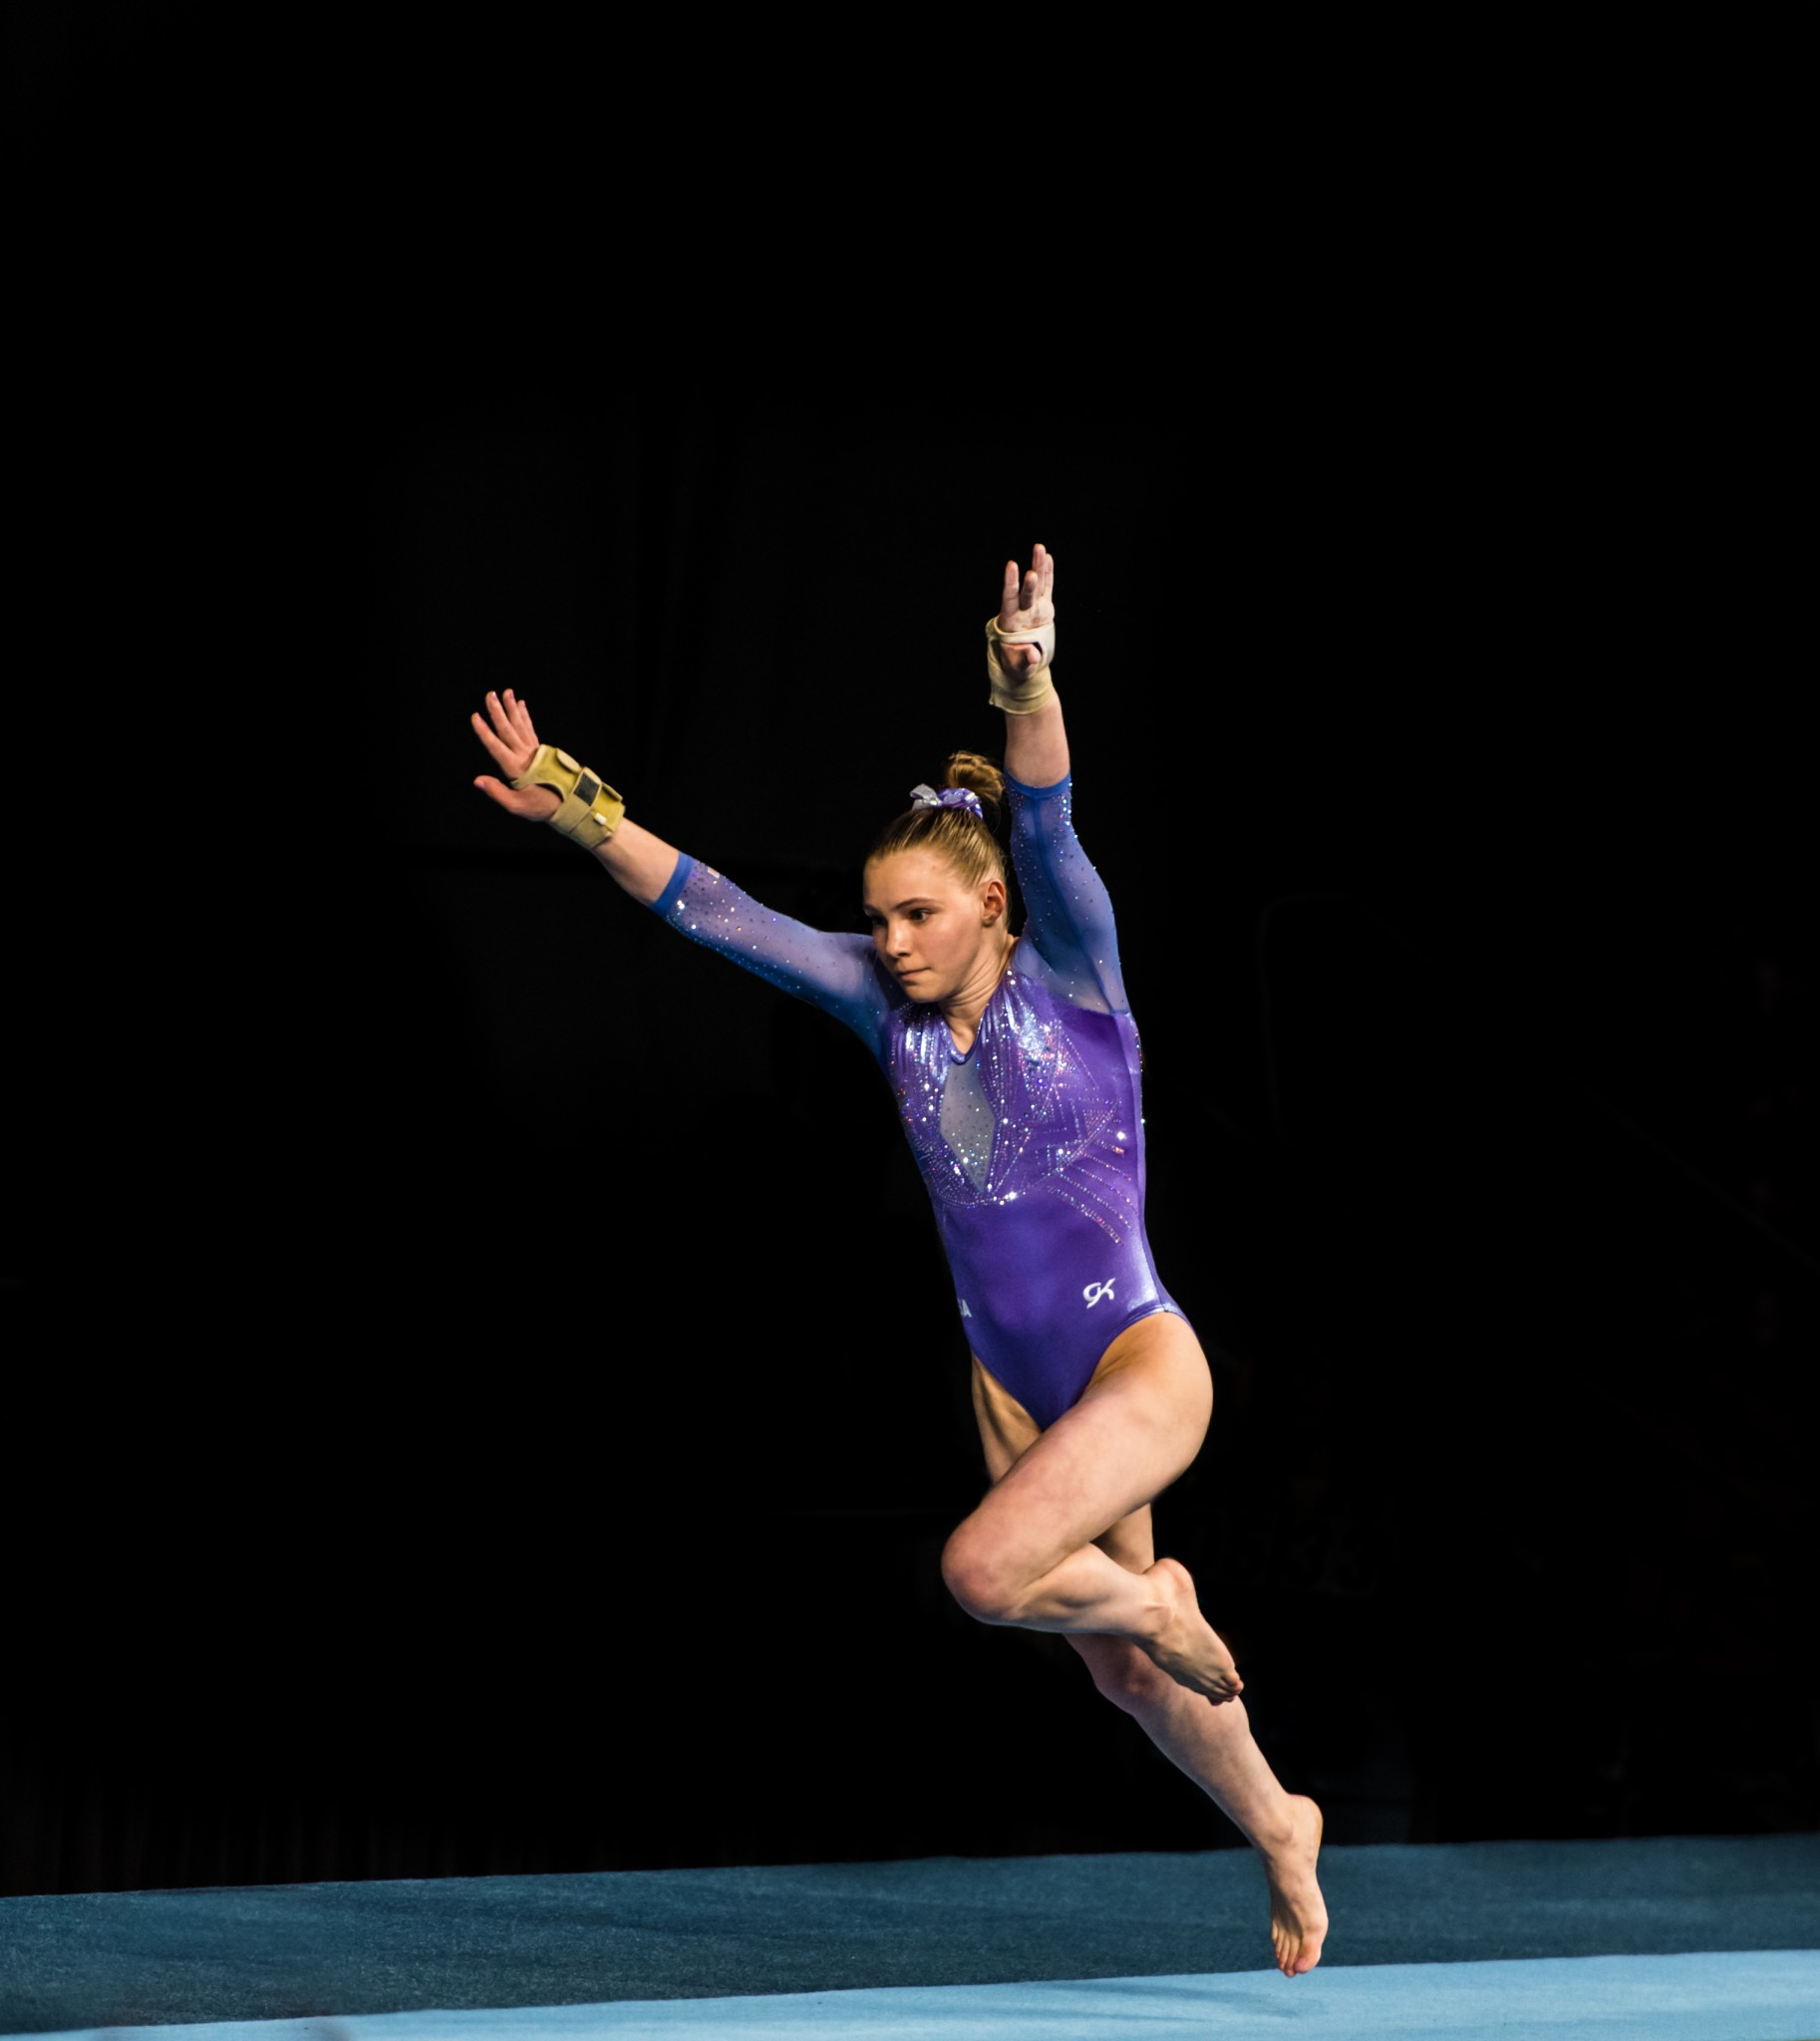 Jade Carey competes in vault in Melbourne, Australia on February 22, 2020. (Alex Bogatyrev/Shutterstock) spectator.org